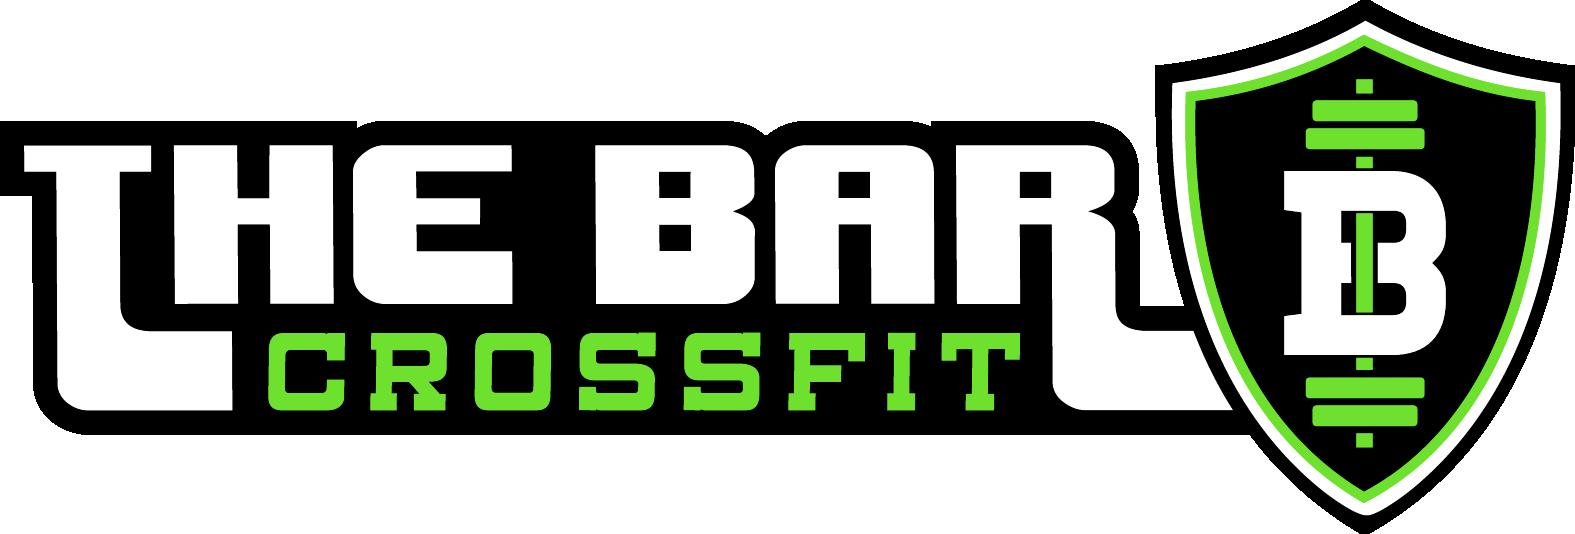 TheBarCrossFitLogoFNLblack.png